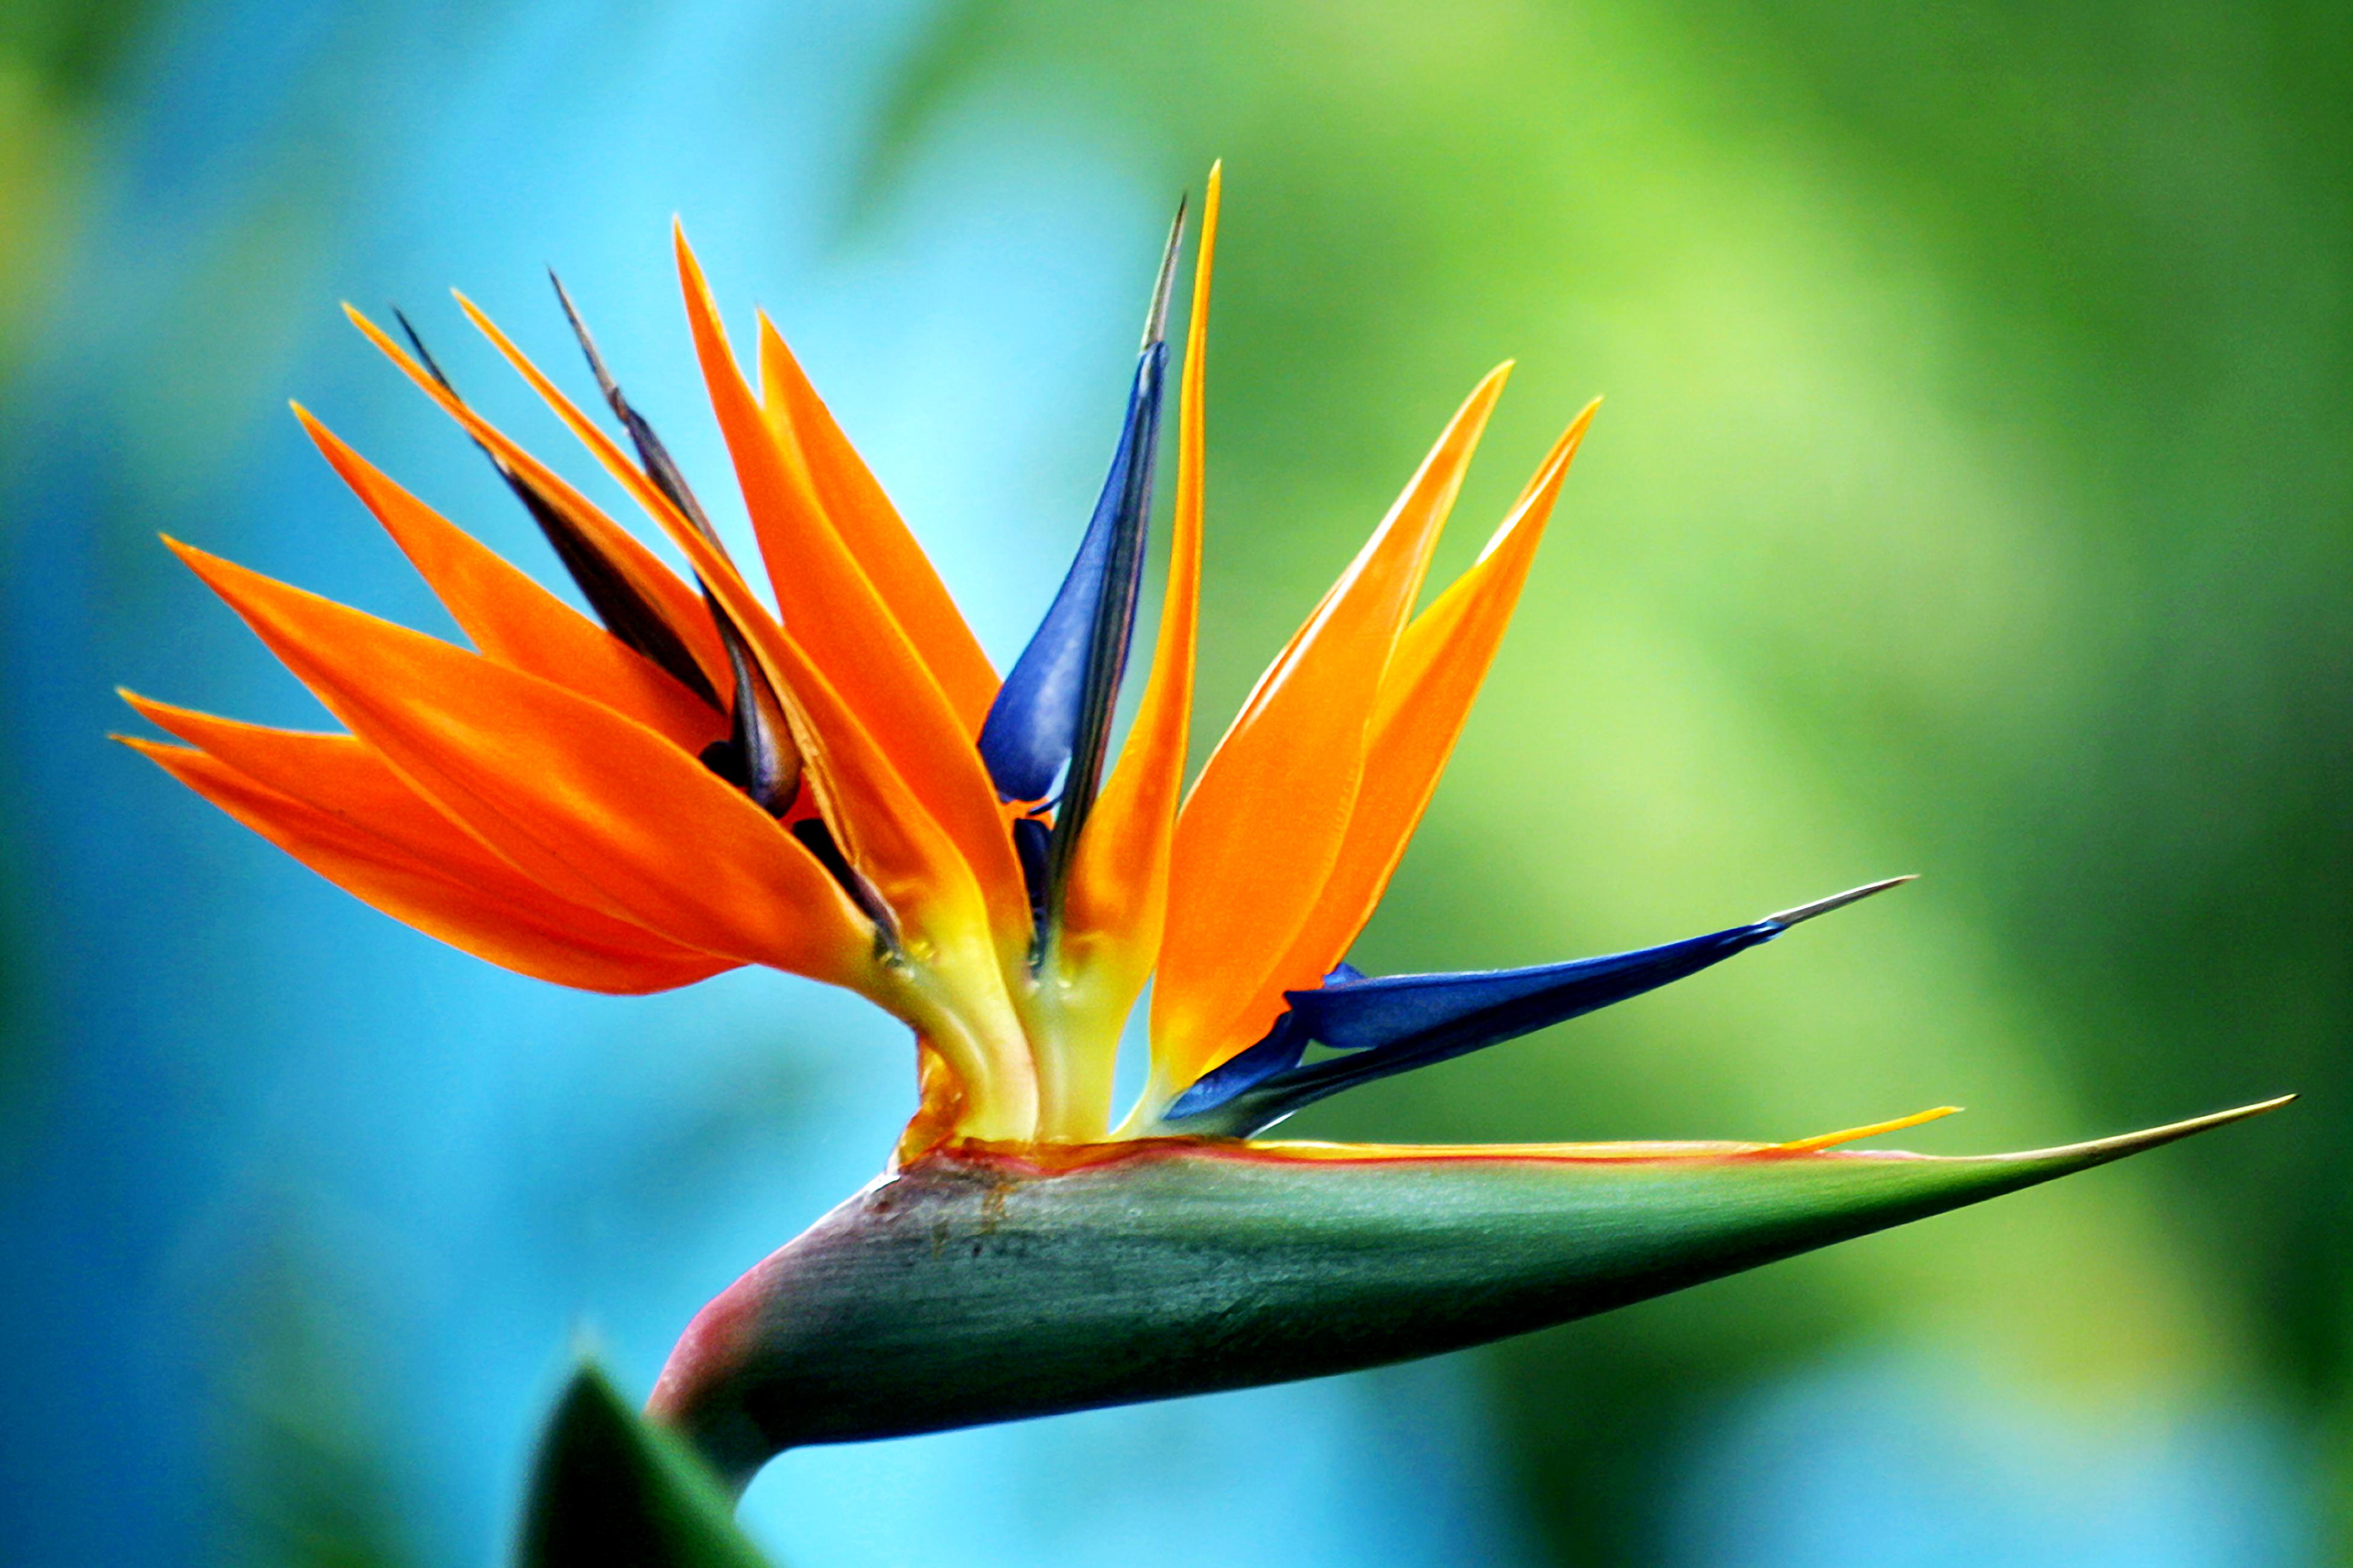 http://fc04.deviantart.net/fs17/f/2007/214/0/2/Blue_Bird_of_Paradise_by_Massano.png